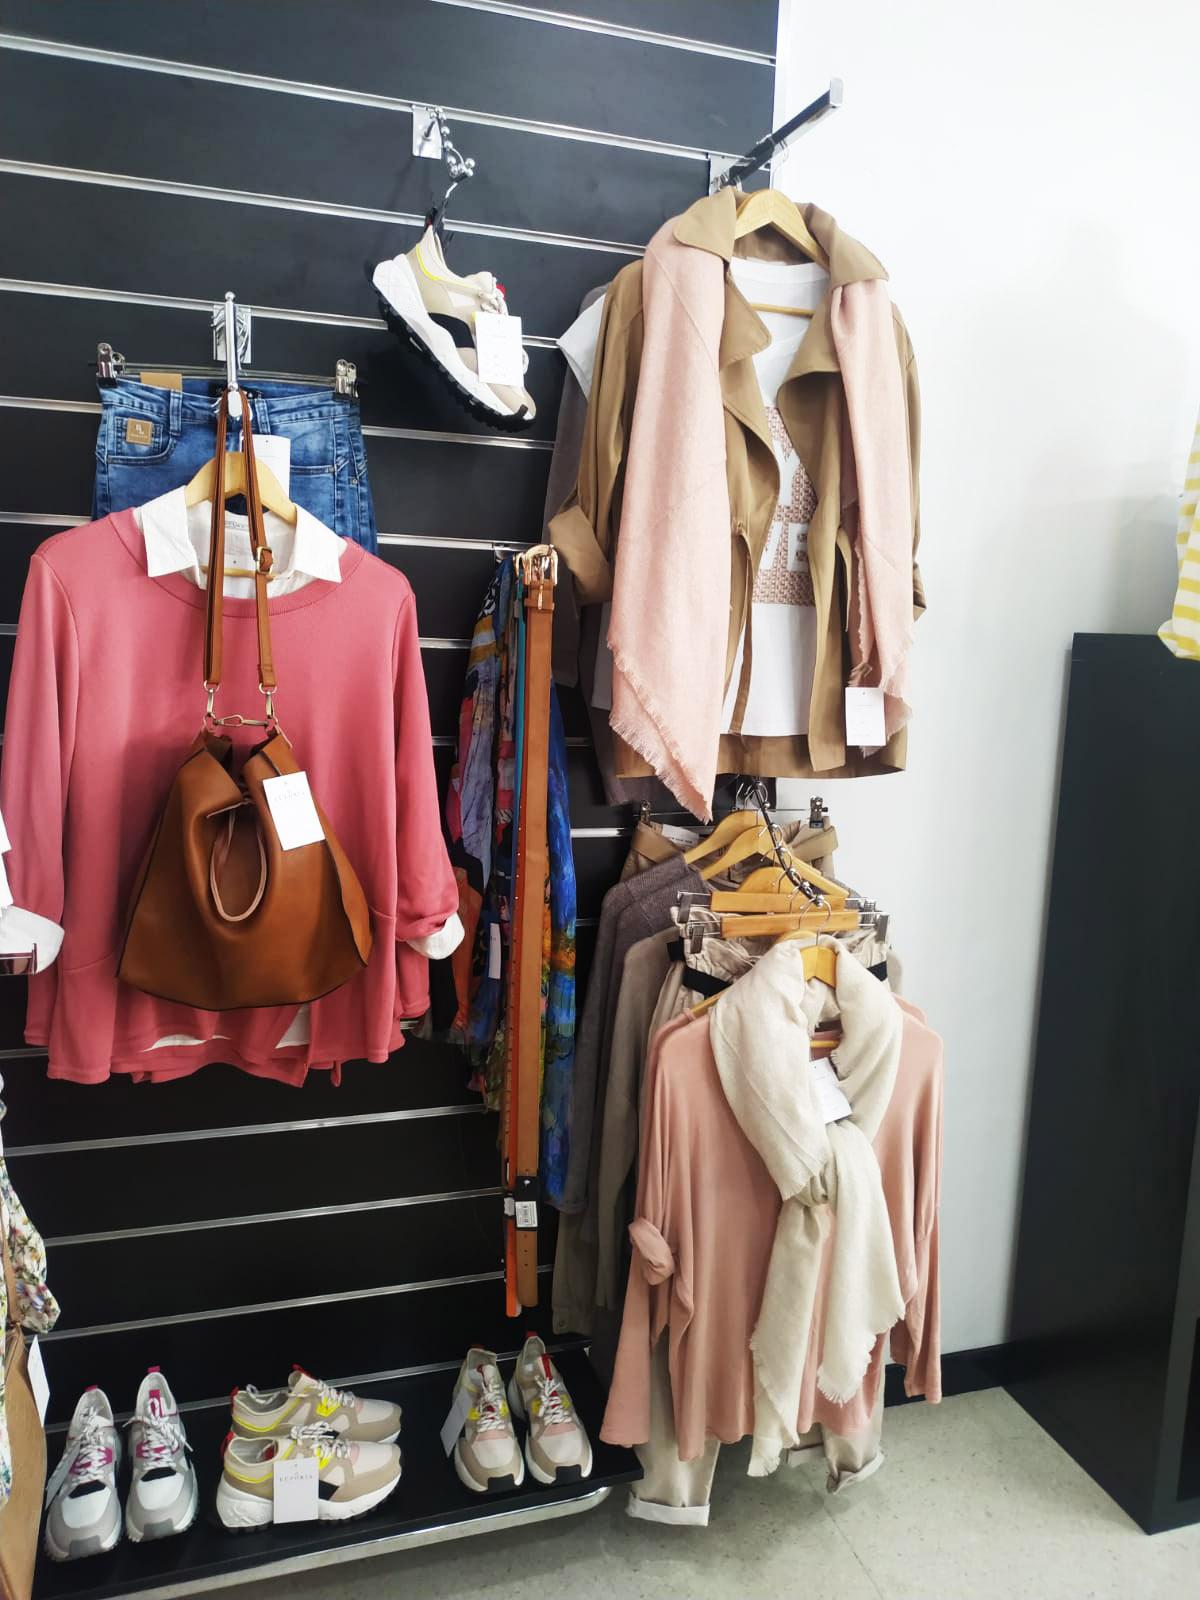 Euforia Modas Tienda